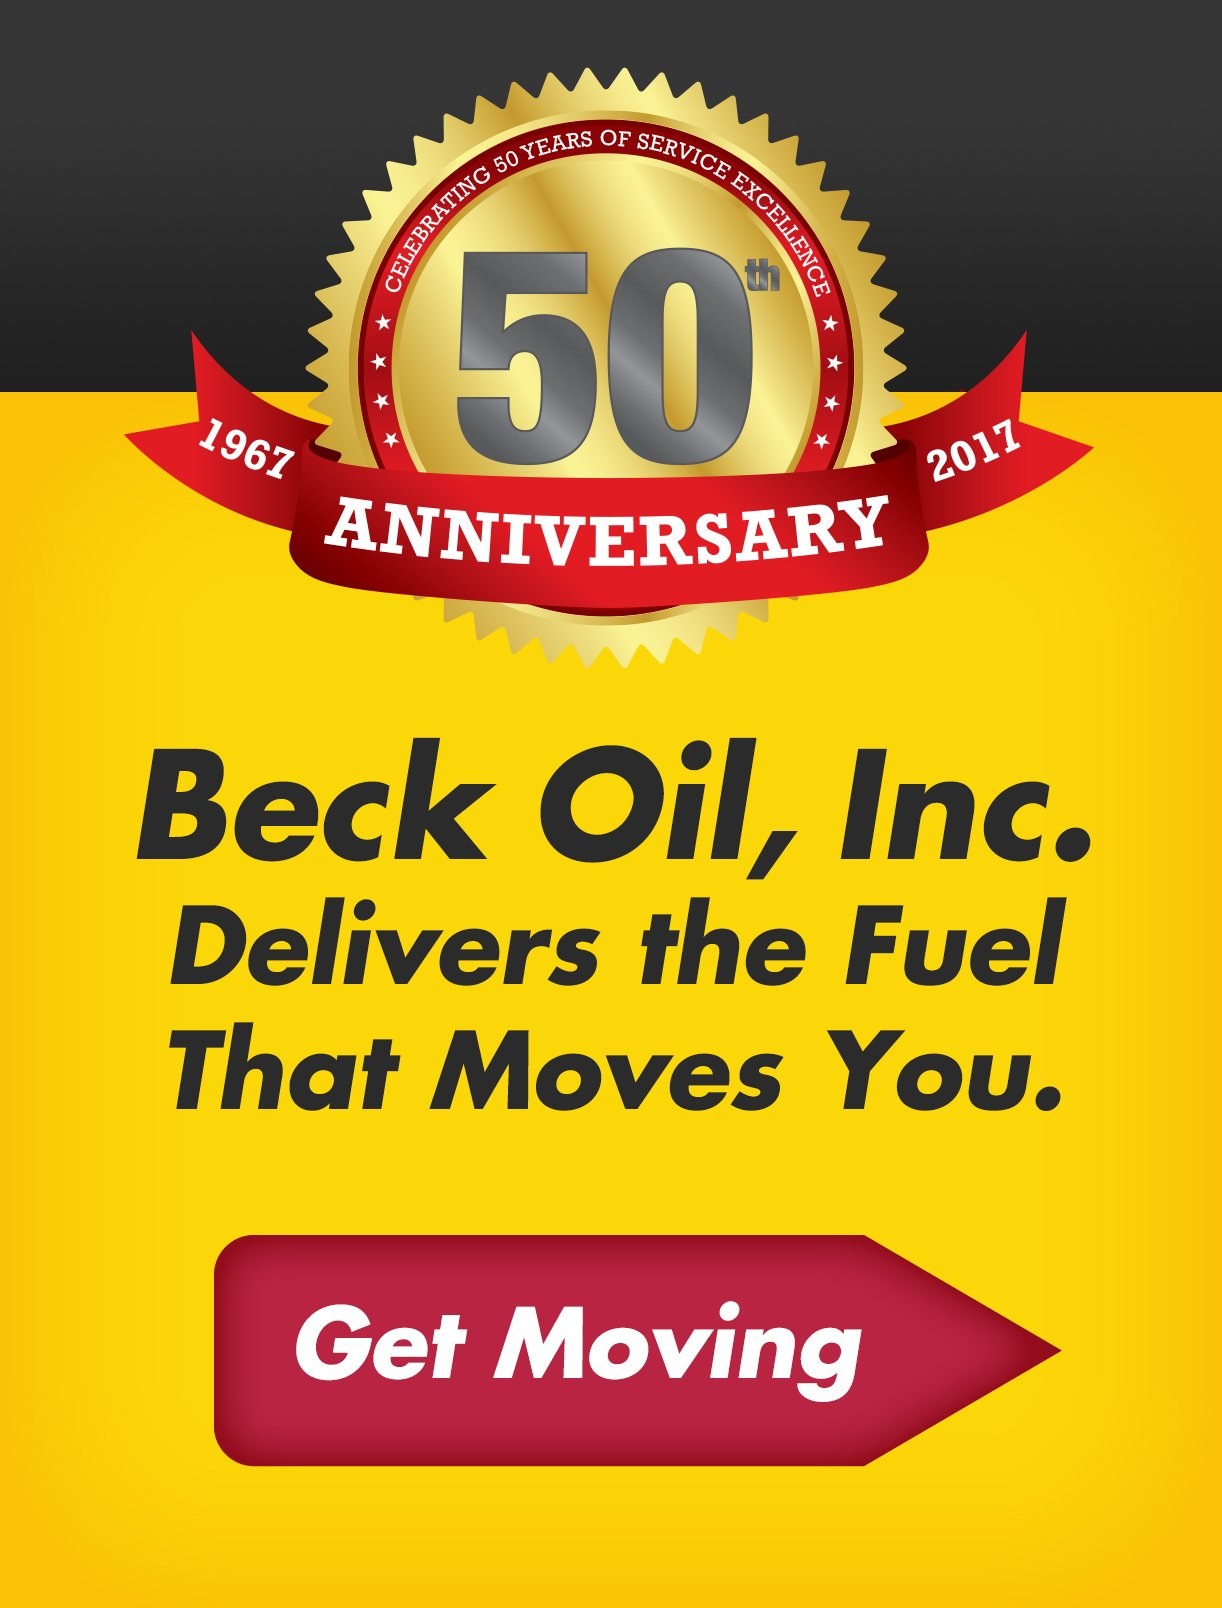 Beck Oil Inc